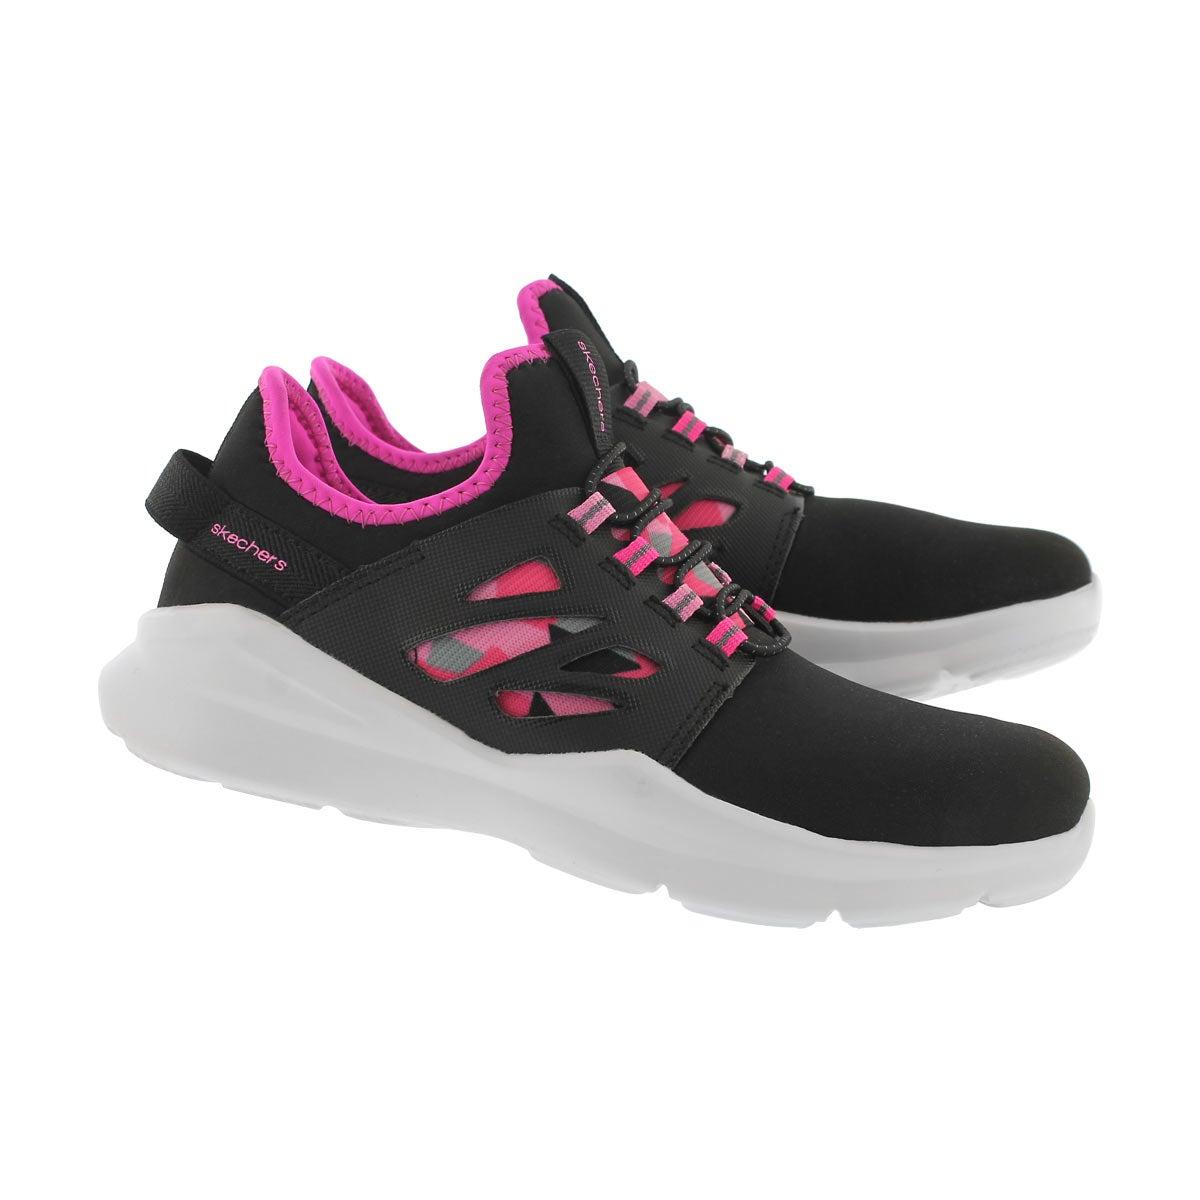 Grls Street Squad blk/pnk slipon sneaker